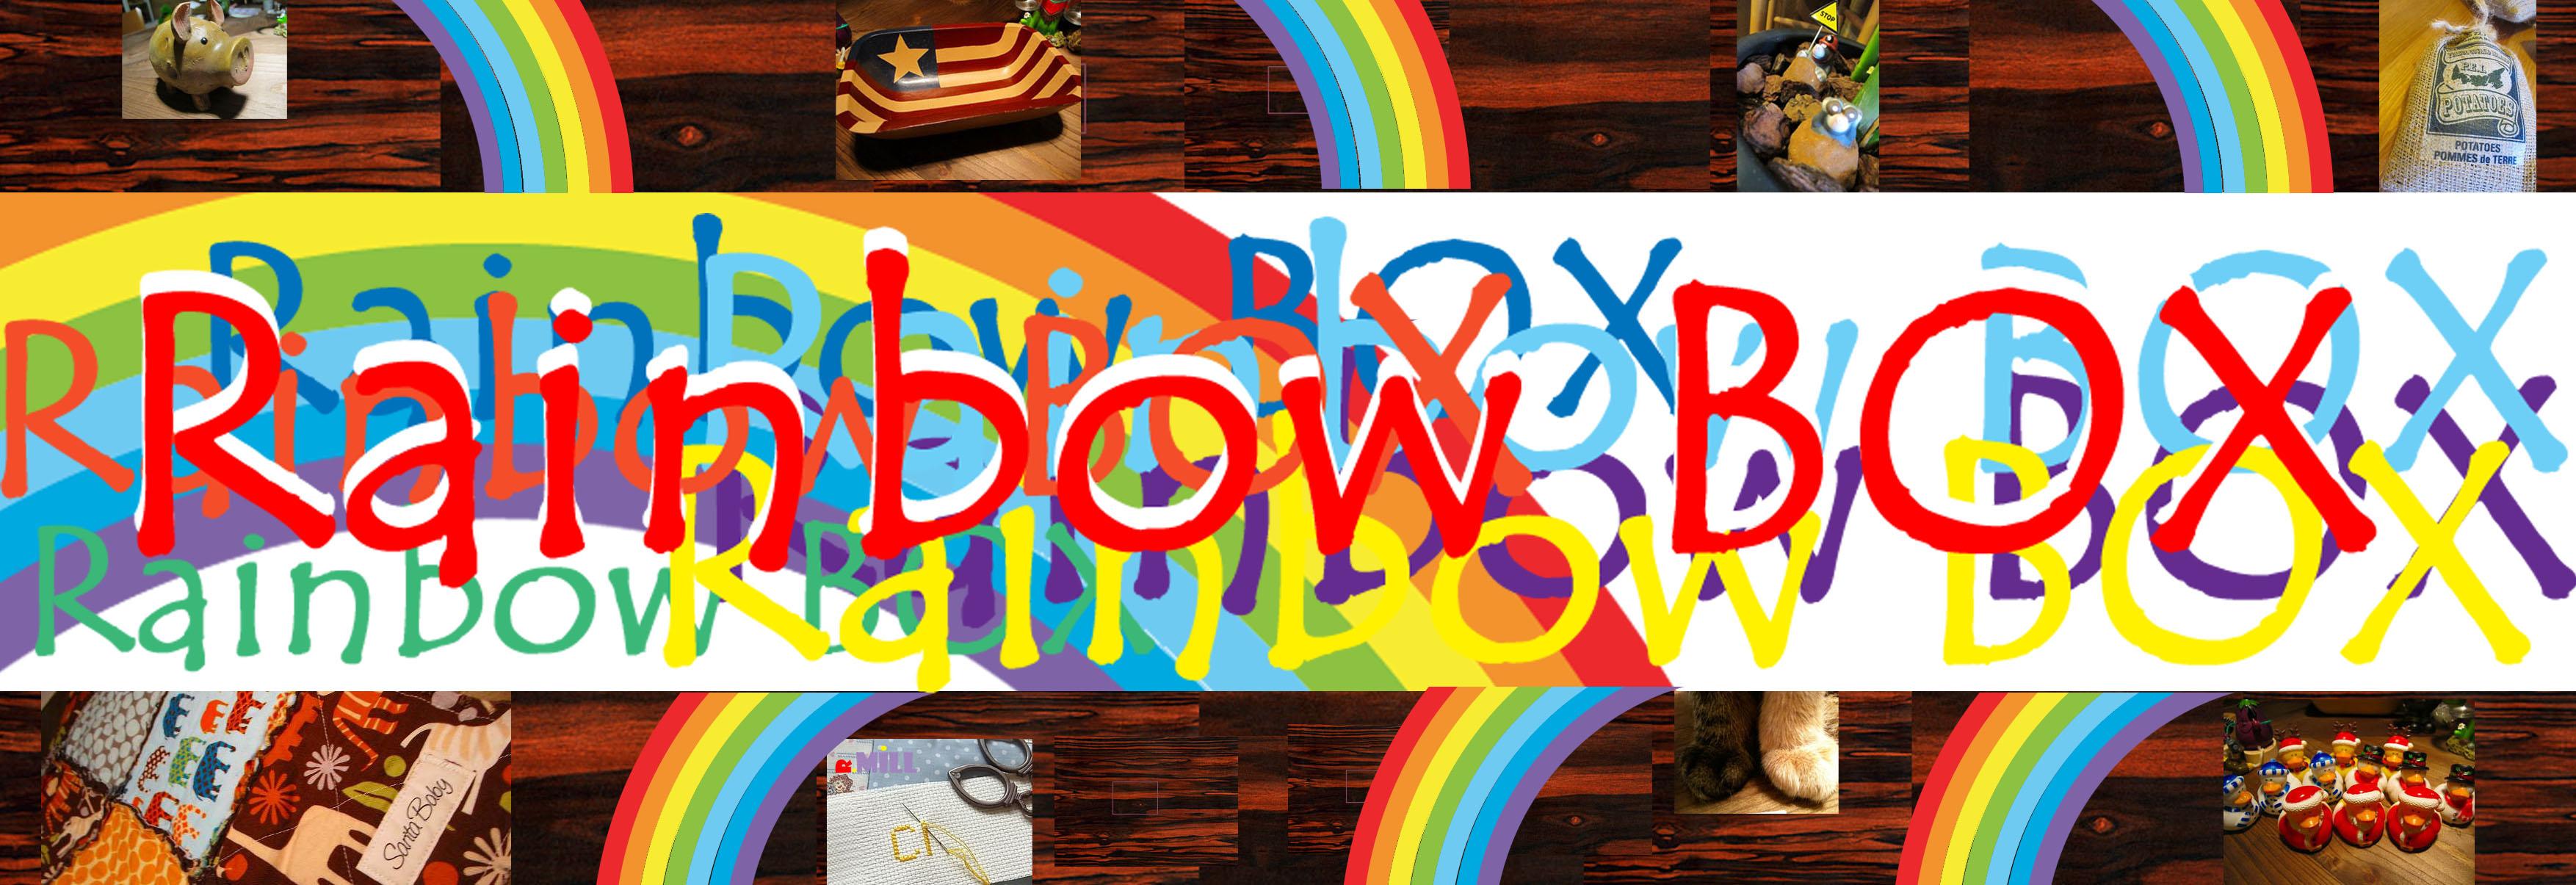 rainbowboxtophppp.jpg